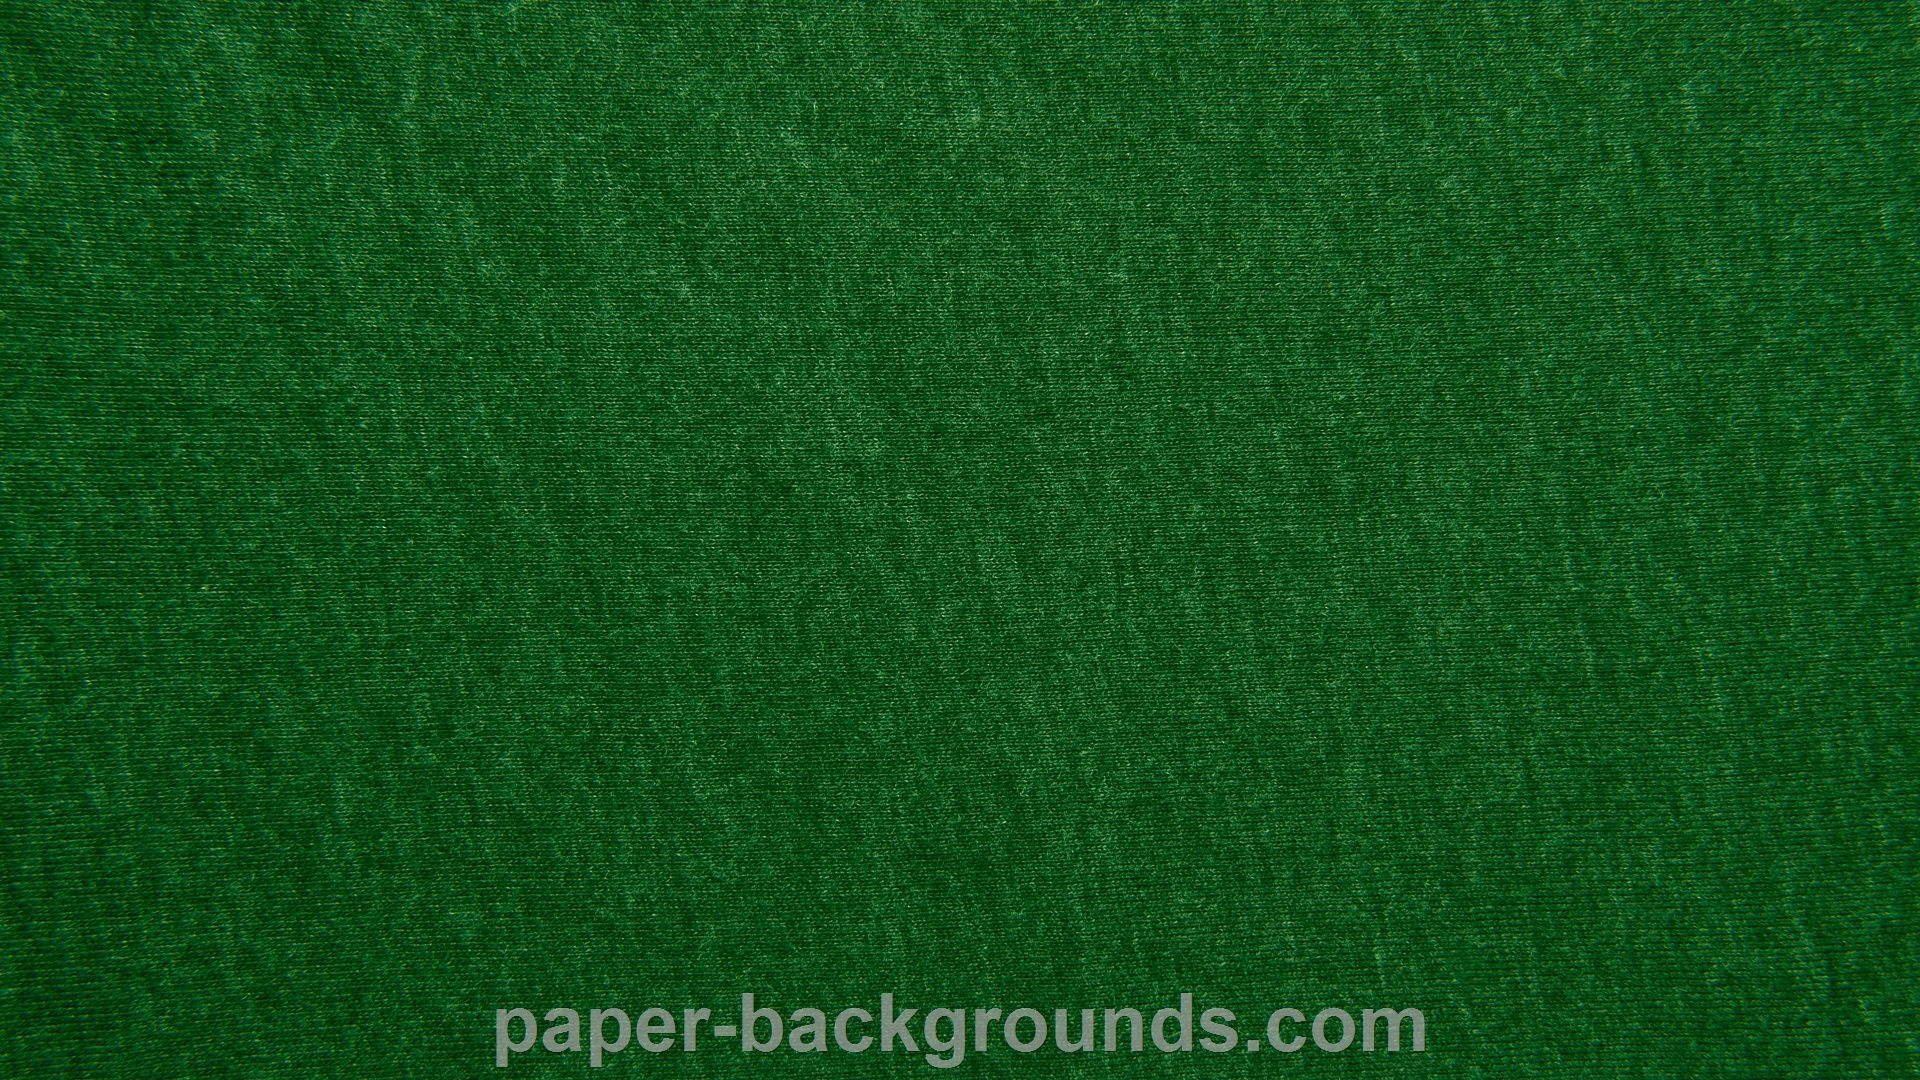 Big Blue chair | Home | Pinterest | Fabric textures, Green ...